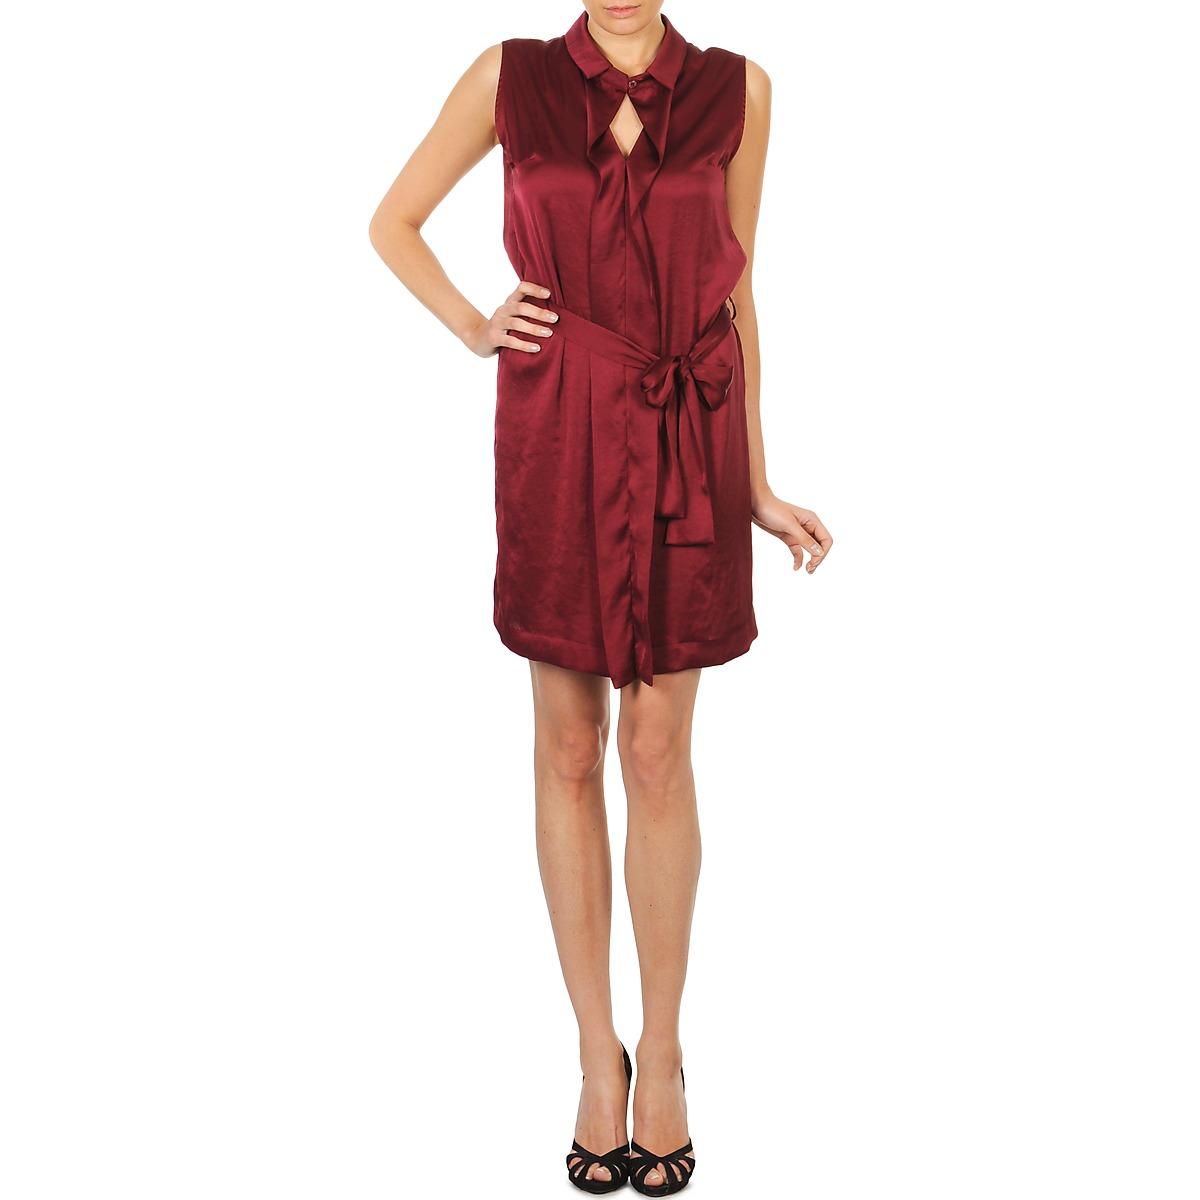 6379a04925ee Κοντά Φορέματα Lola ROSE ESTATE Σύνθεση  Πολυεστέρας